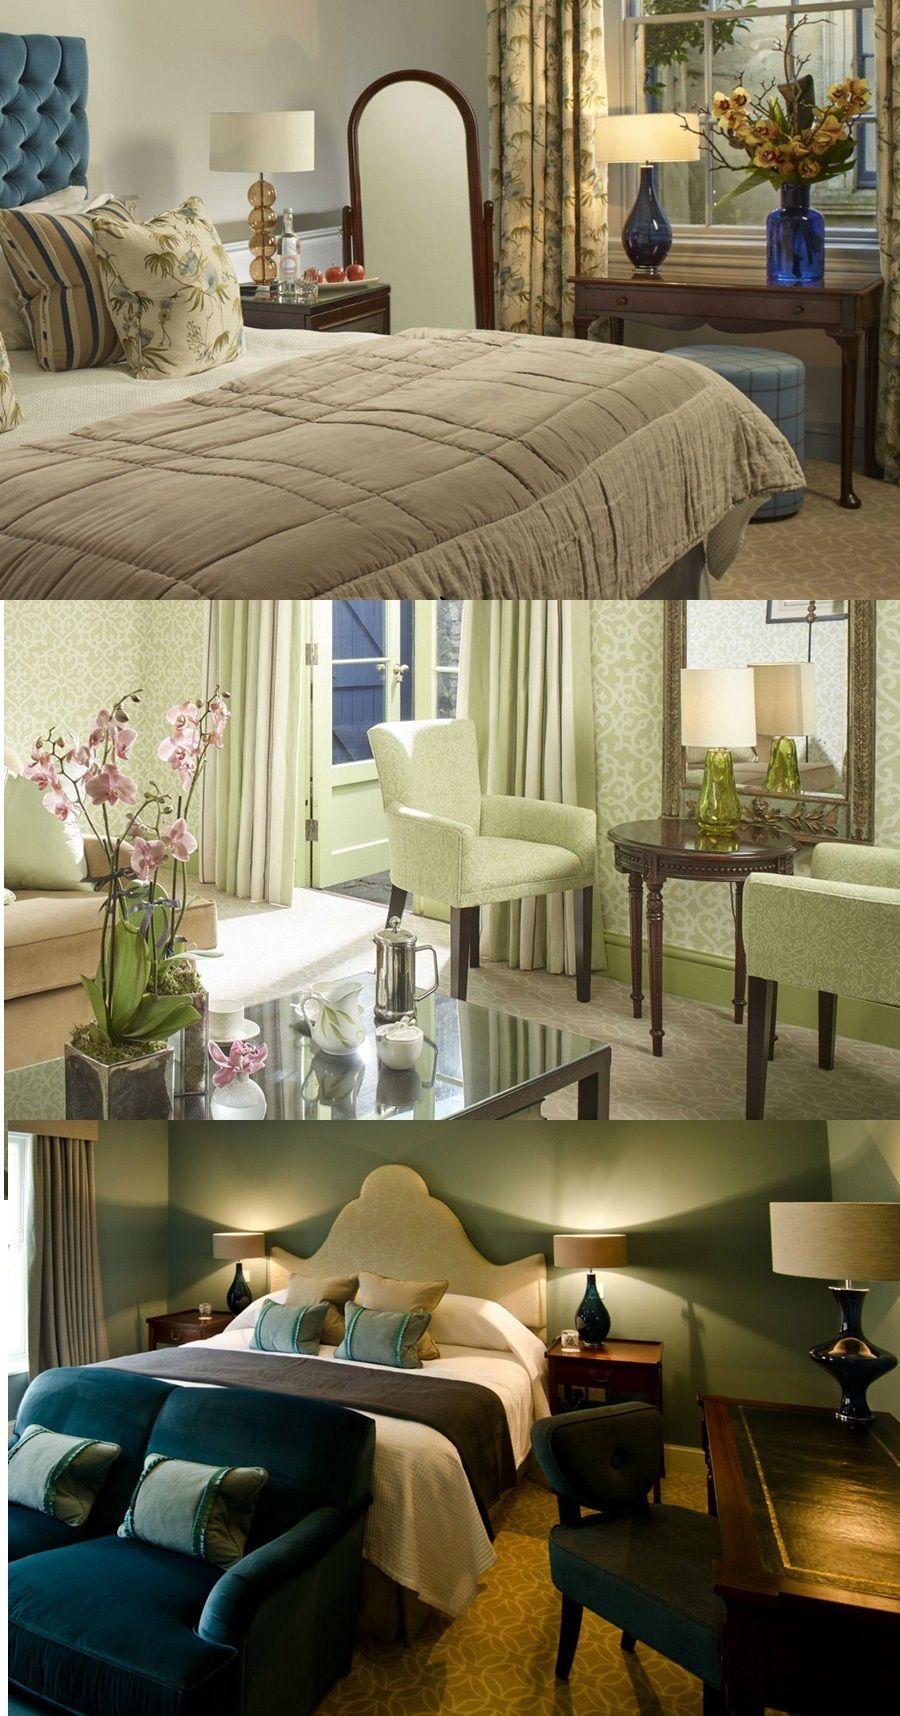 Hotel Guest Room Design